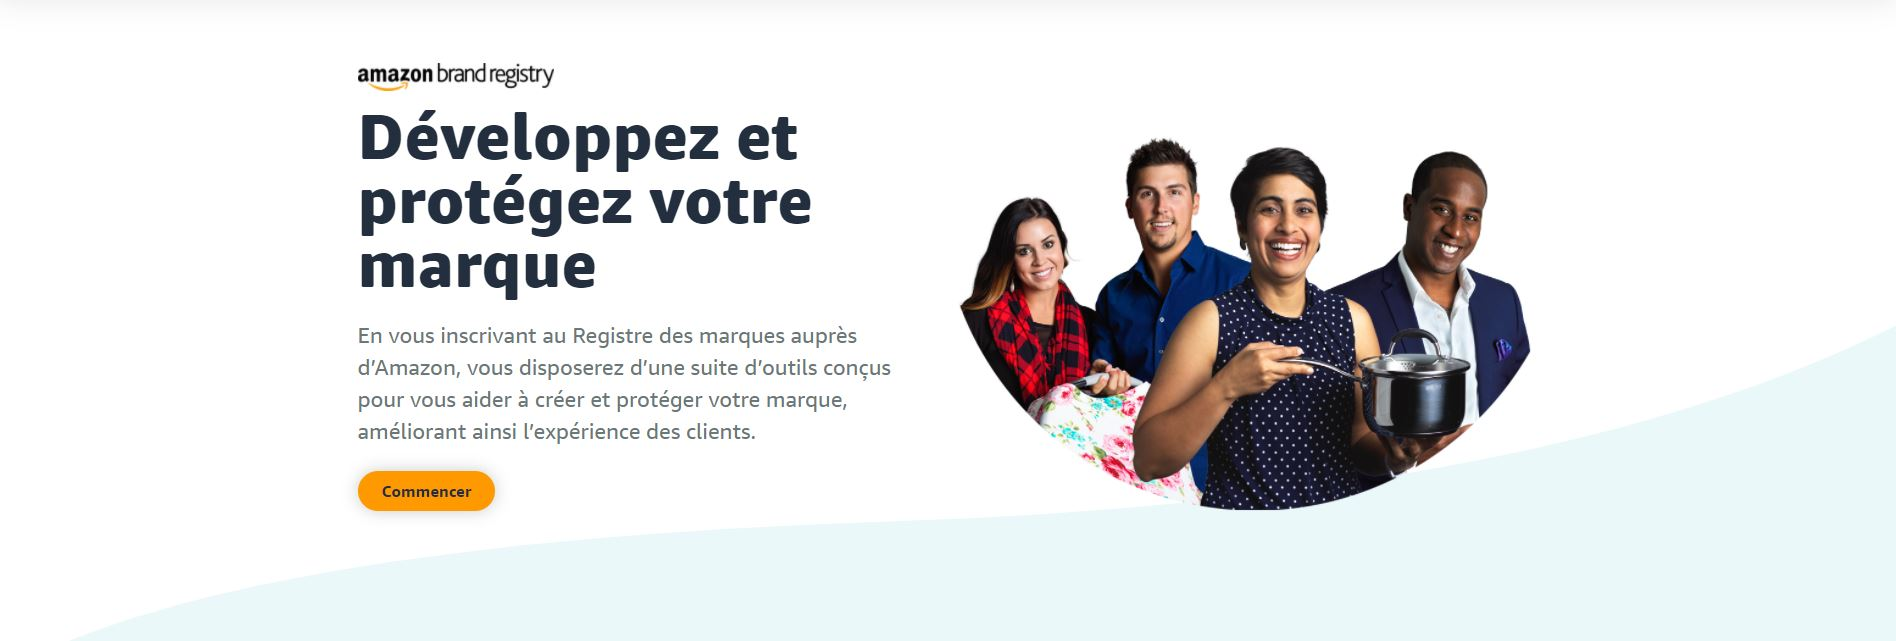 Intellifox mini-formation - Amazon Brand Registry - reussir sur amazon fba